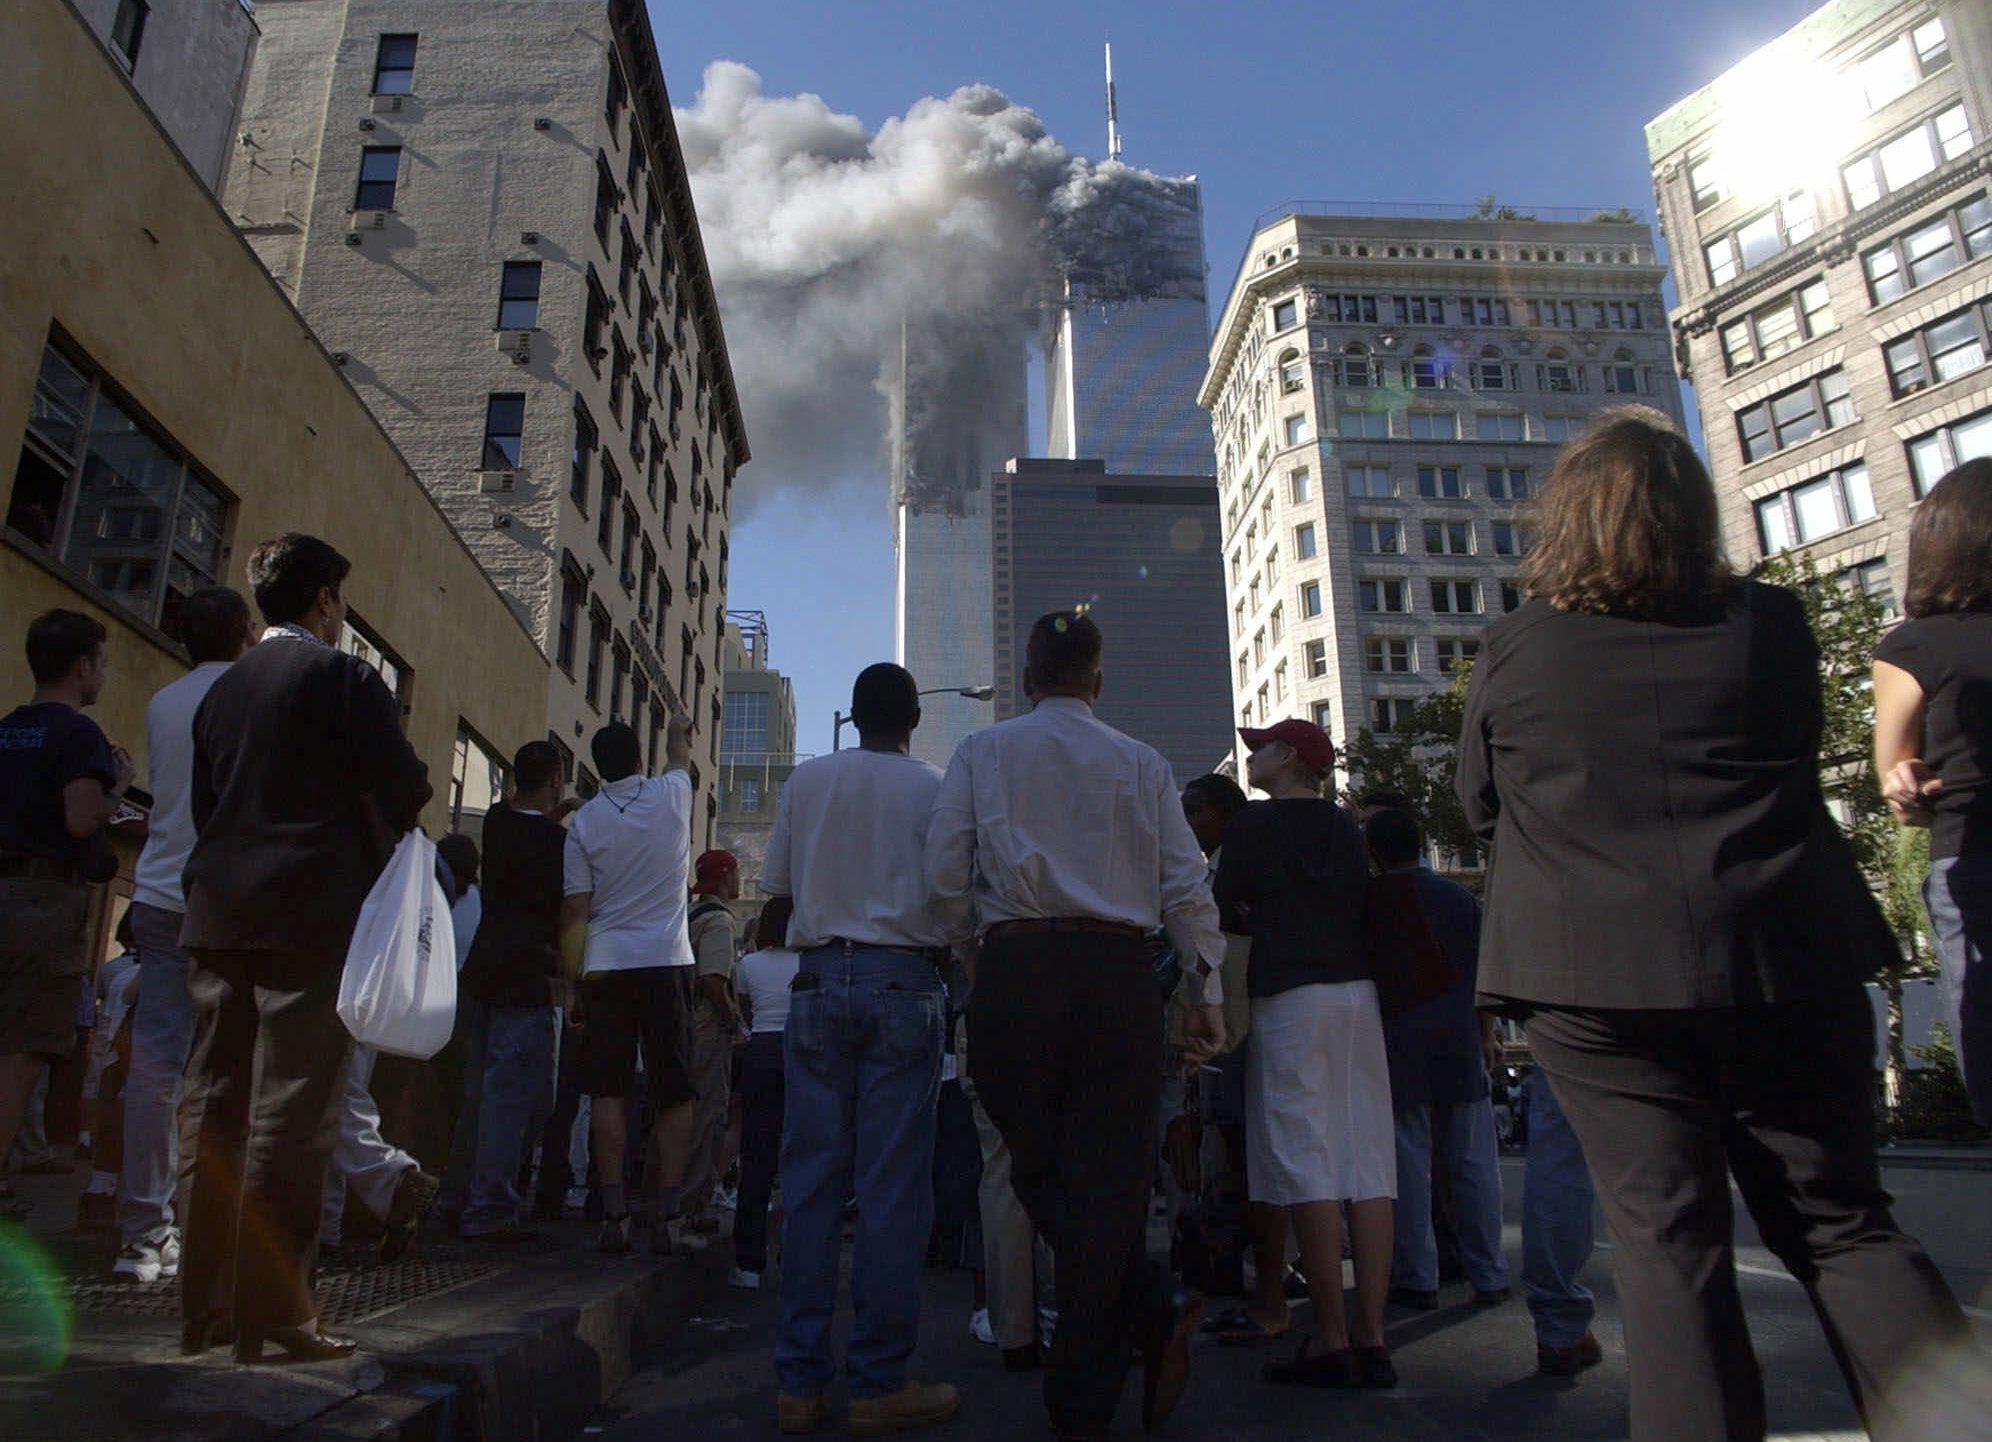 Pedestrians in lower Manhattan watch smoke billow from New York's World Trade Center on Tuesday, Sept. 11, 2001. (AP Photo/Amy Sancetta)